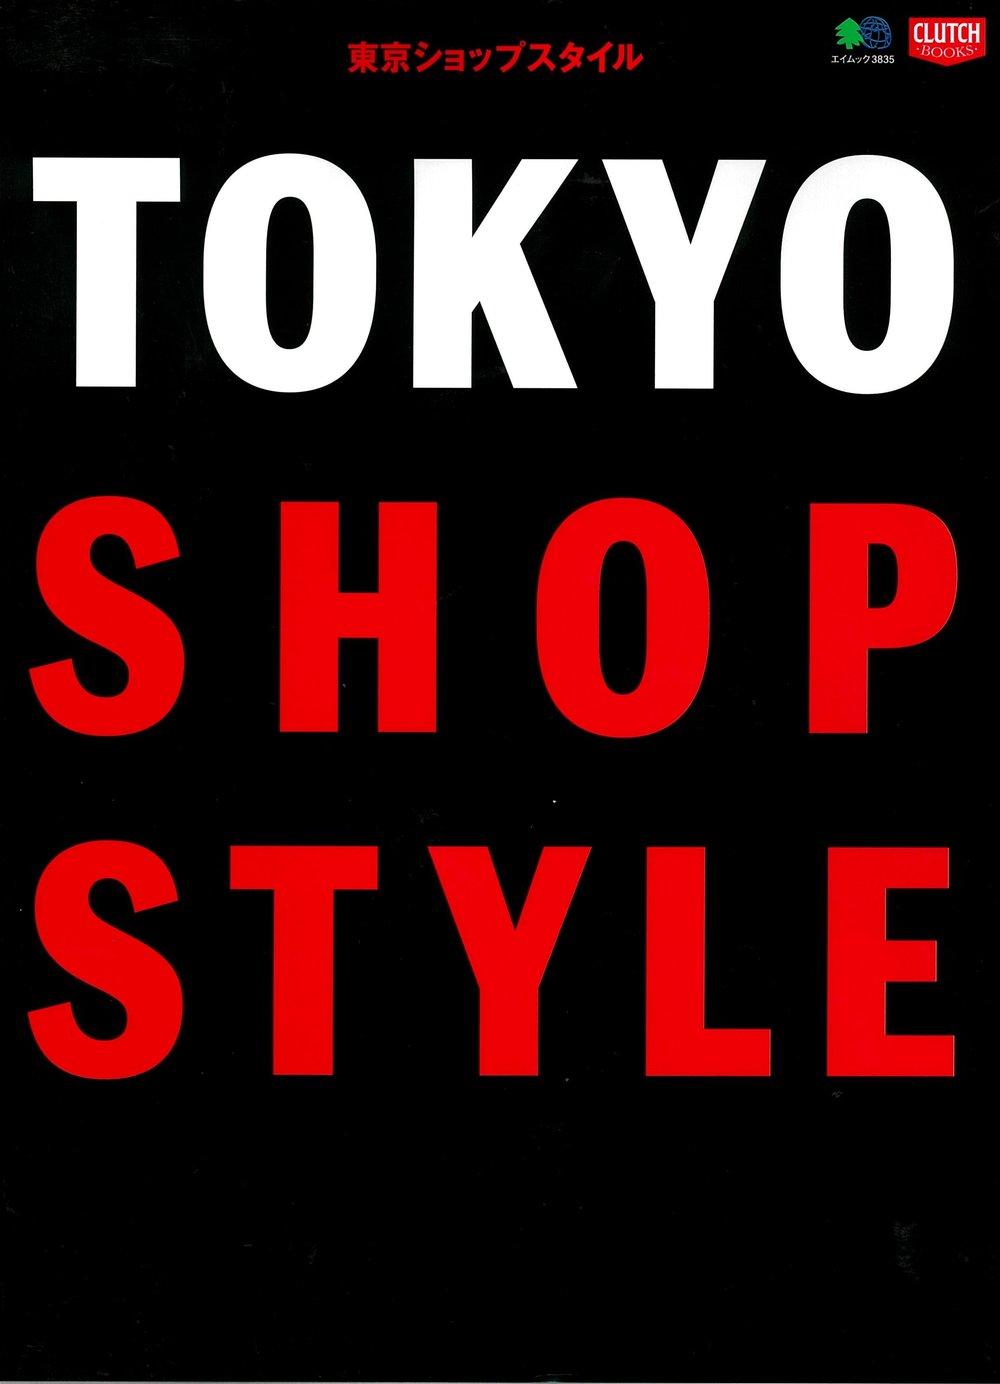 TOKYO SHOP STYLE | September 2017